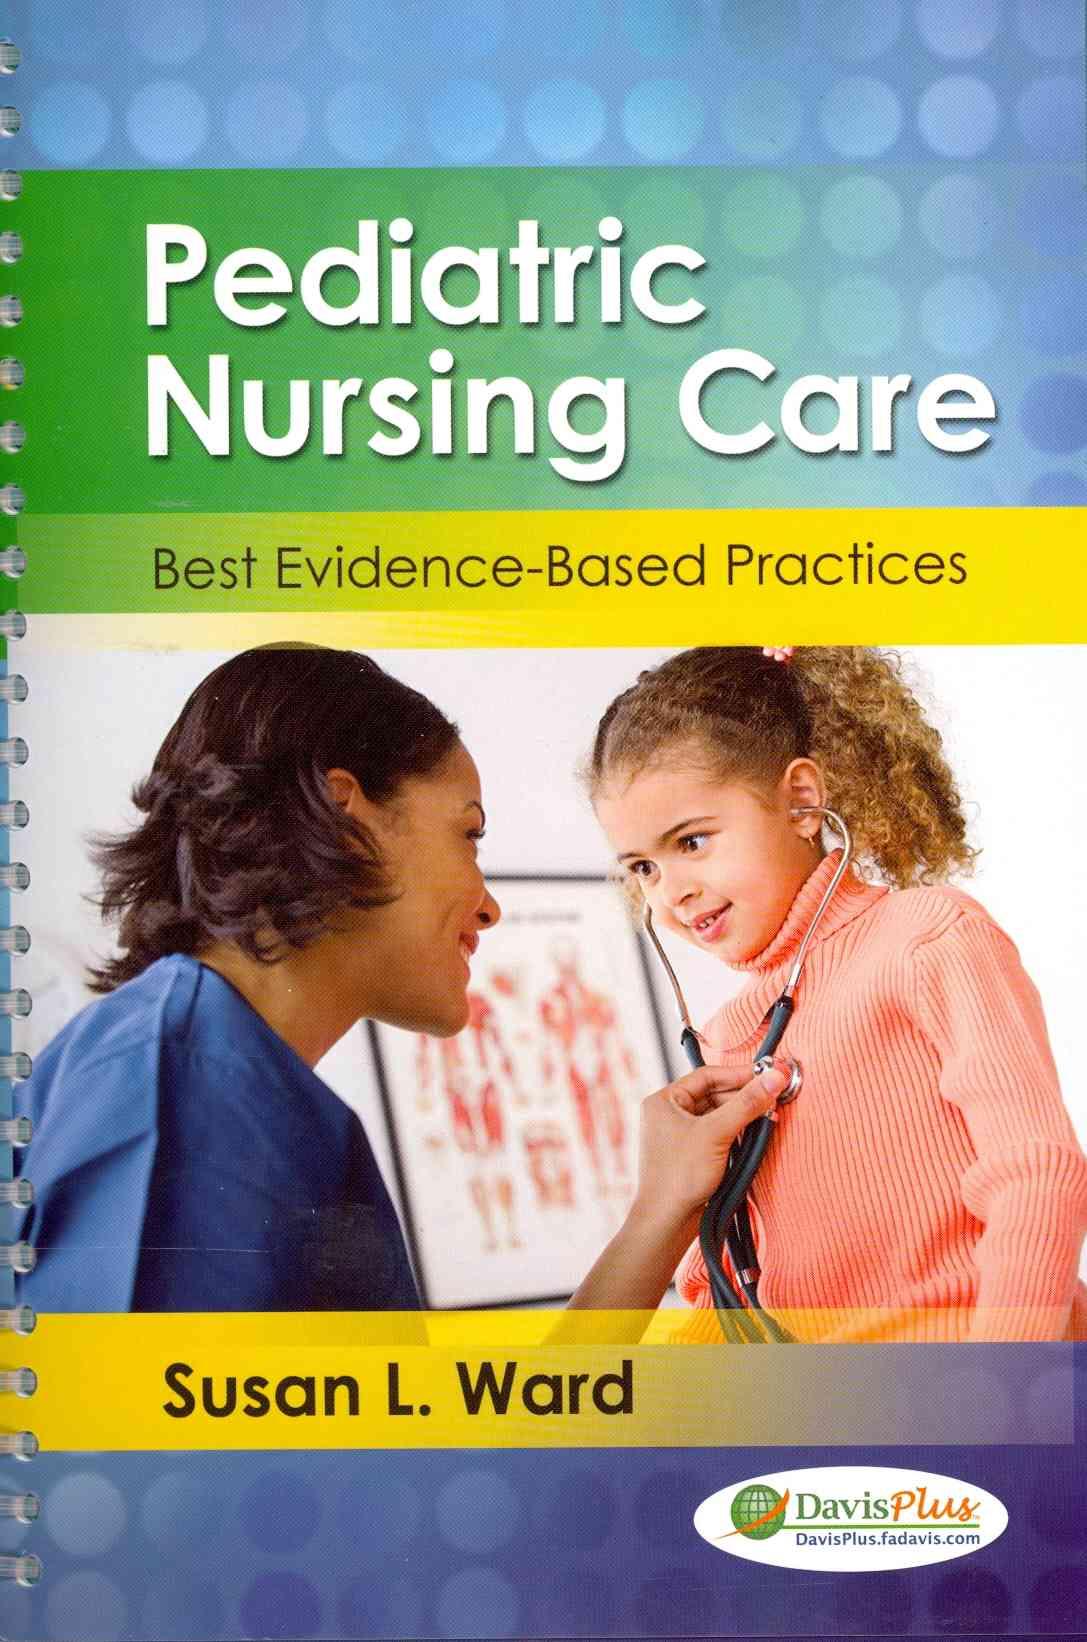 Pediatric Nursing Care By Ward, Susan